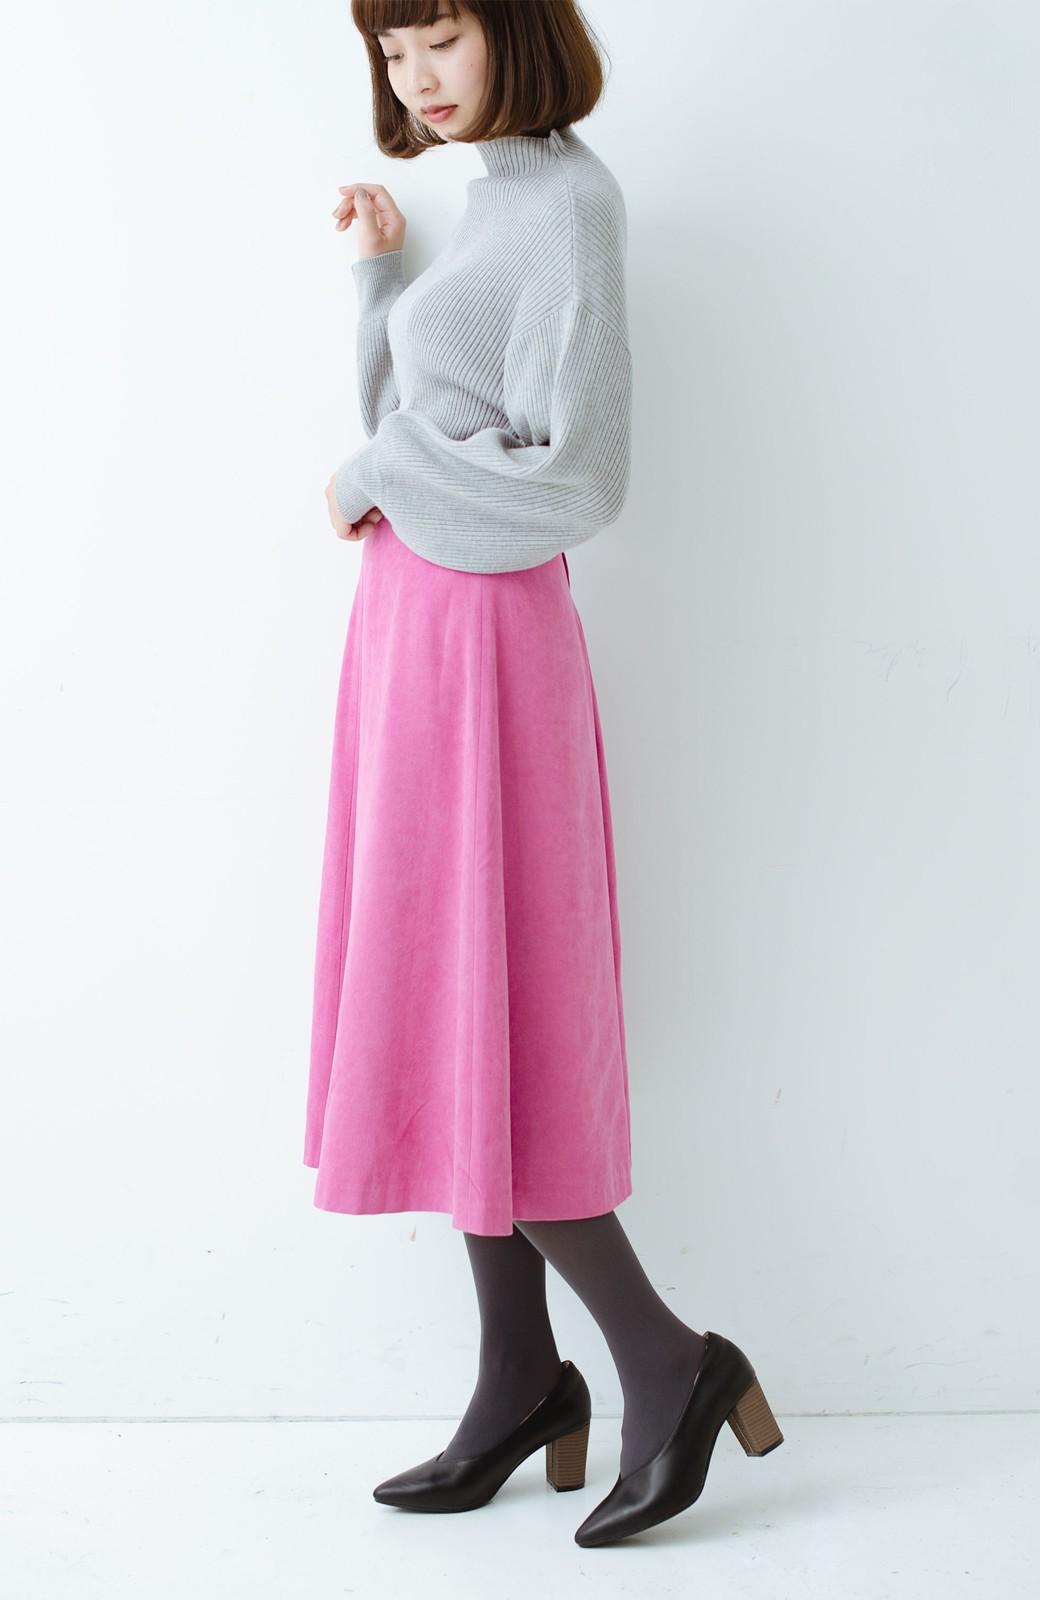 haco! 女っぽく上品に見える フレアースカート by que made me <ピンク>の商品写真14